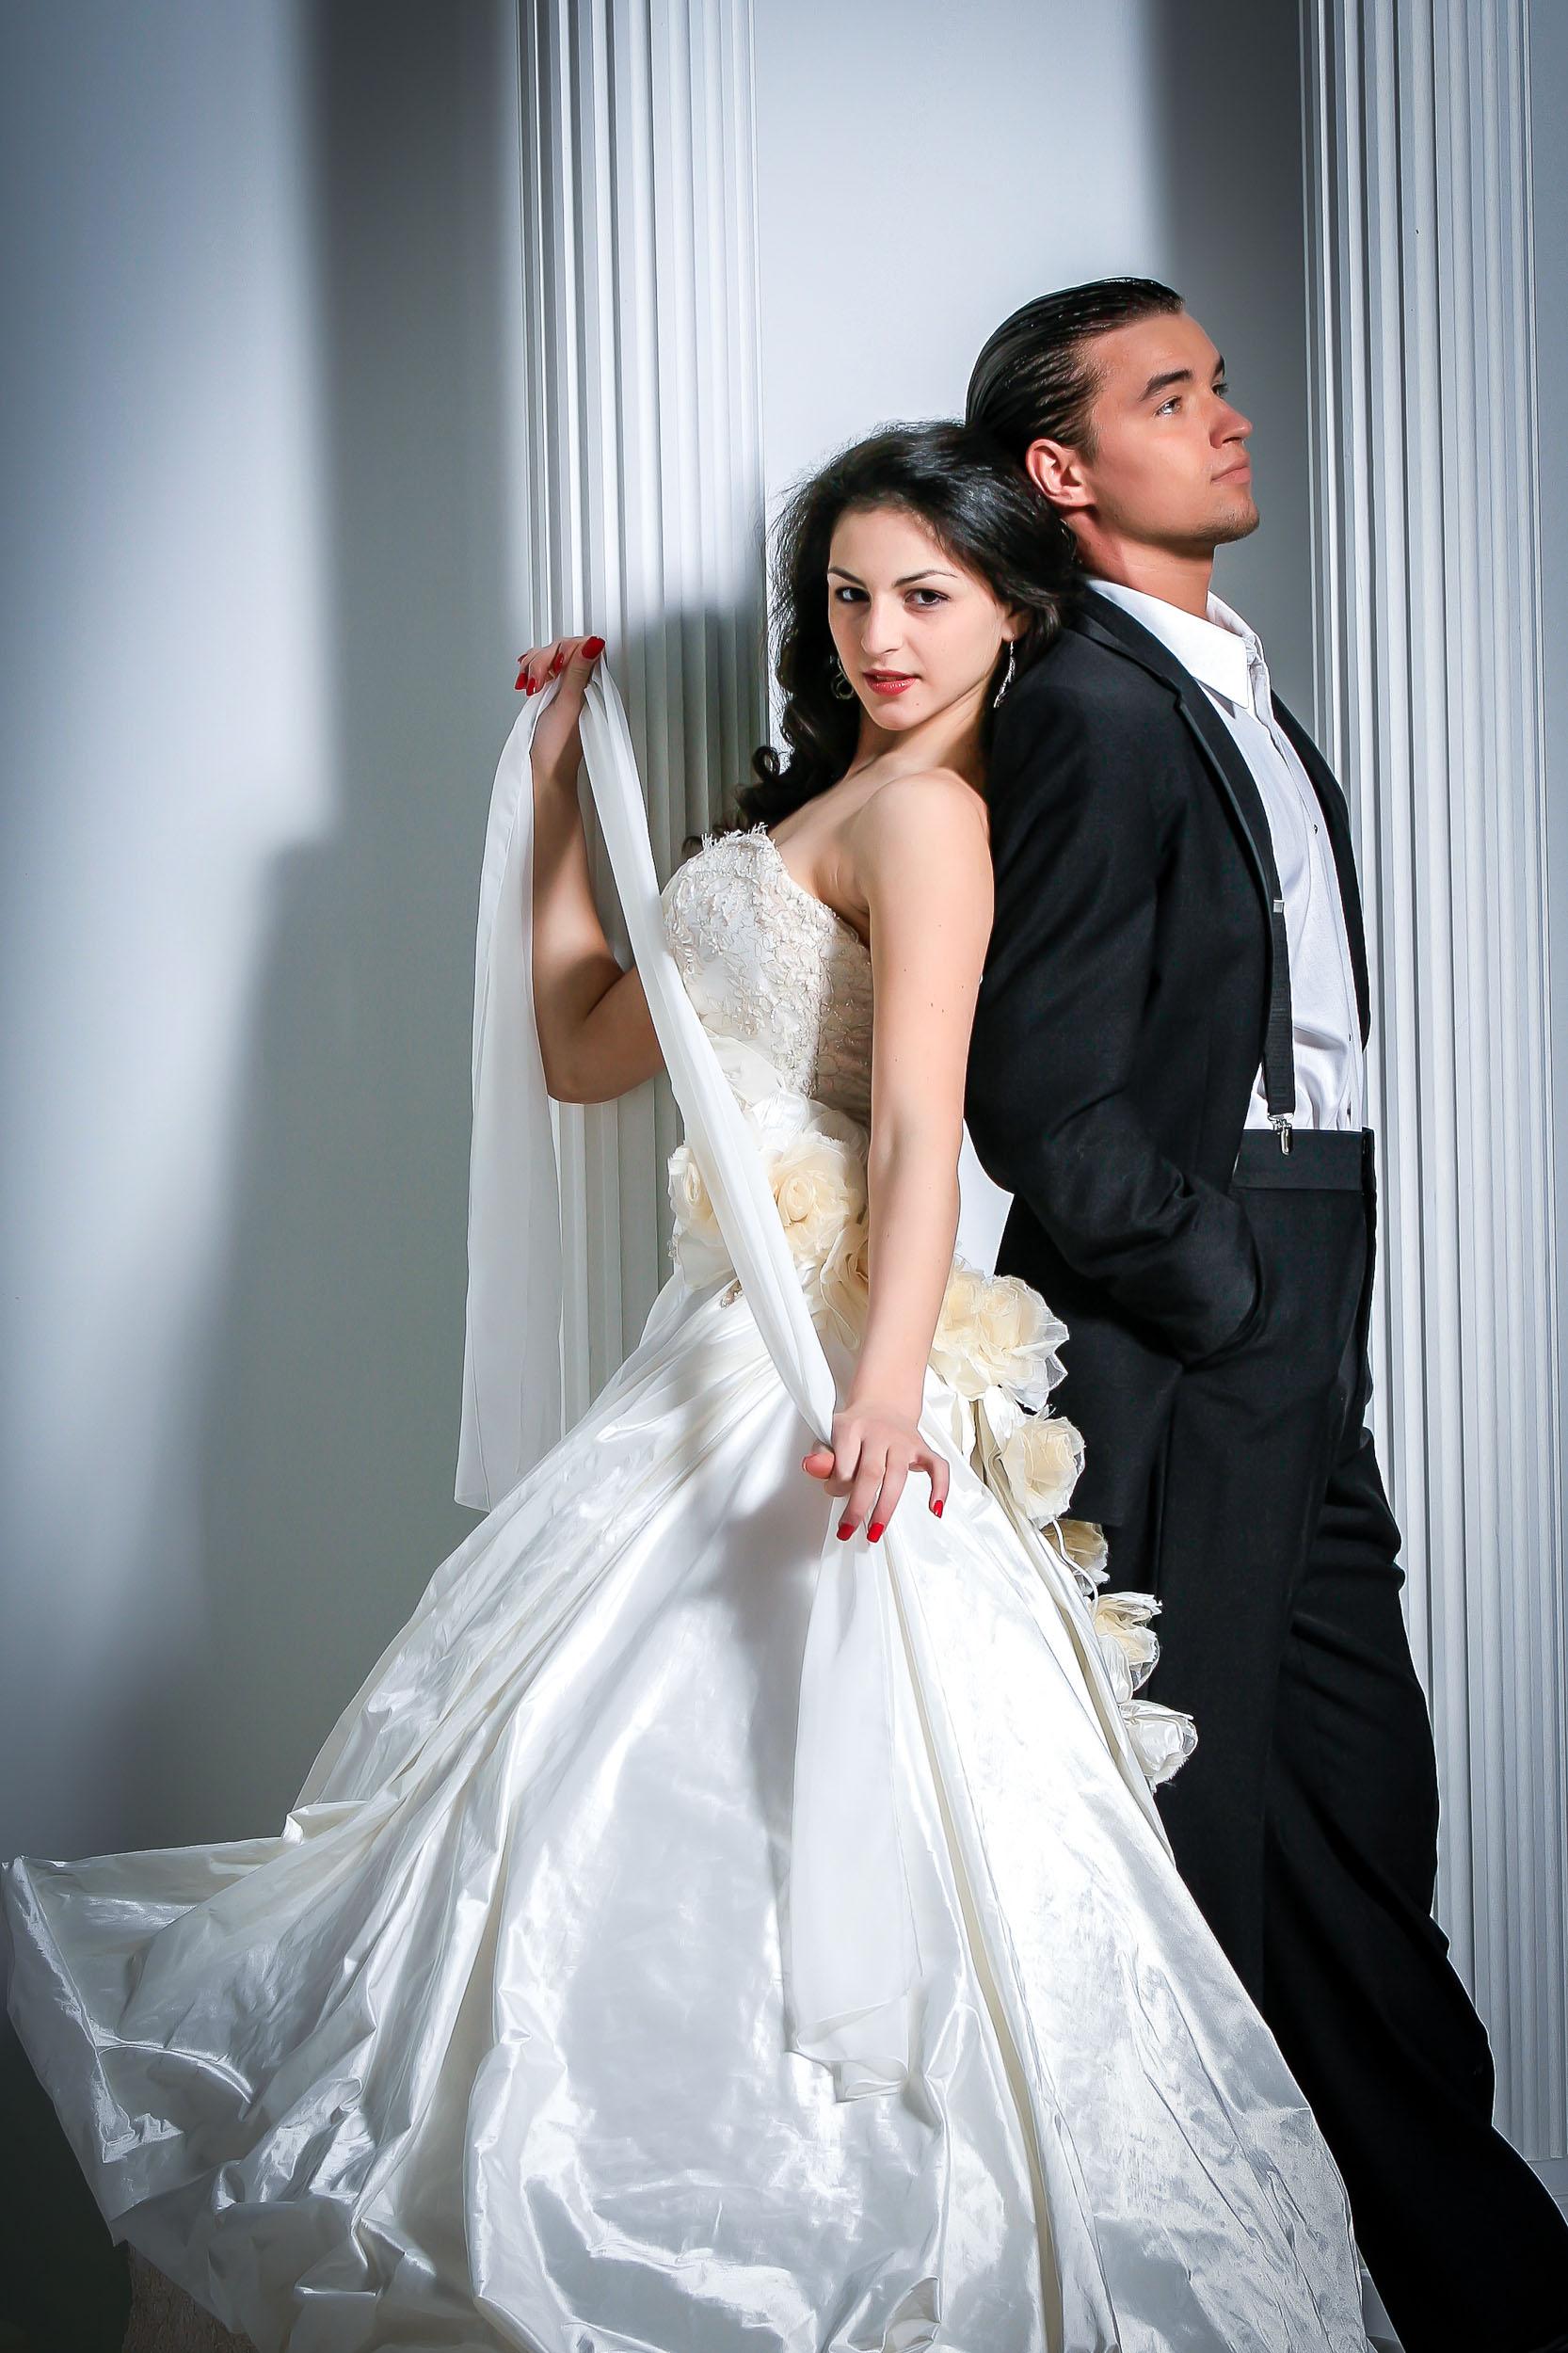 Wedding_Photography_Photo_Studio_Newmarket-22.jpg